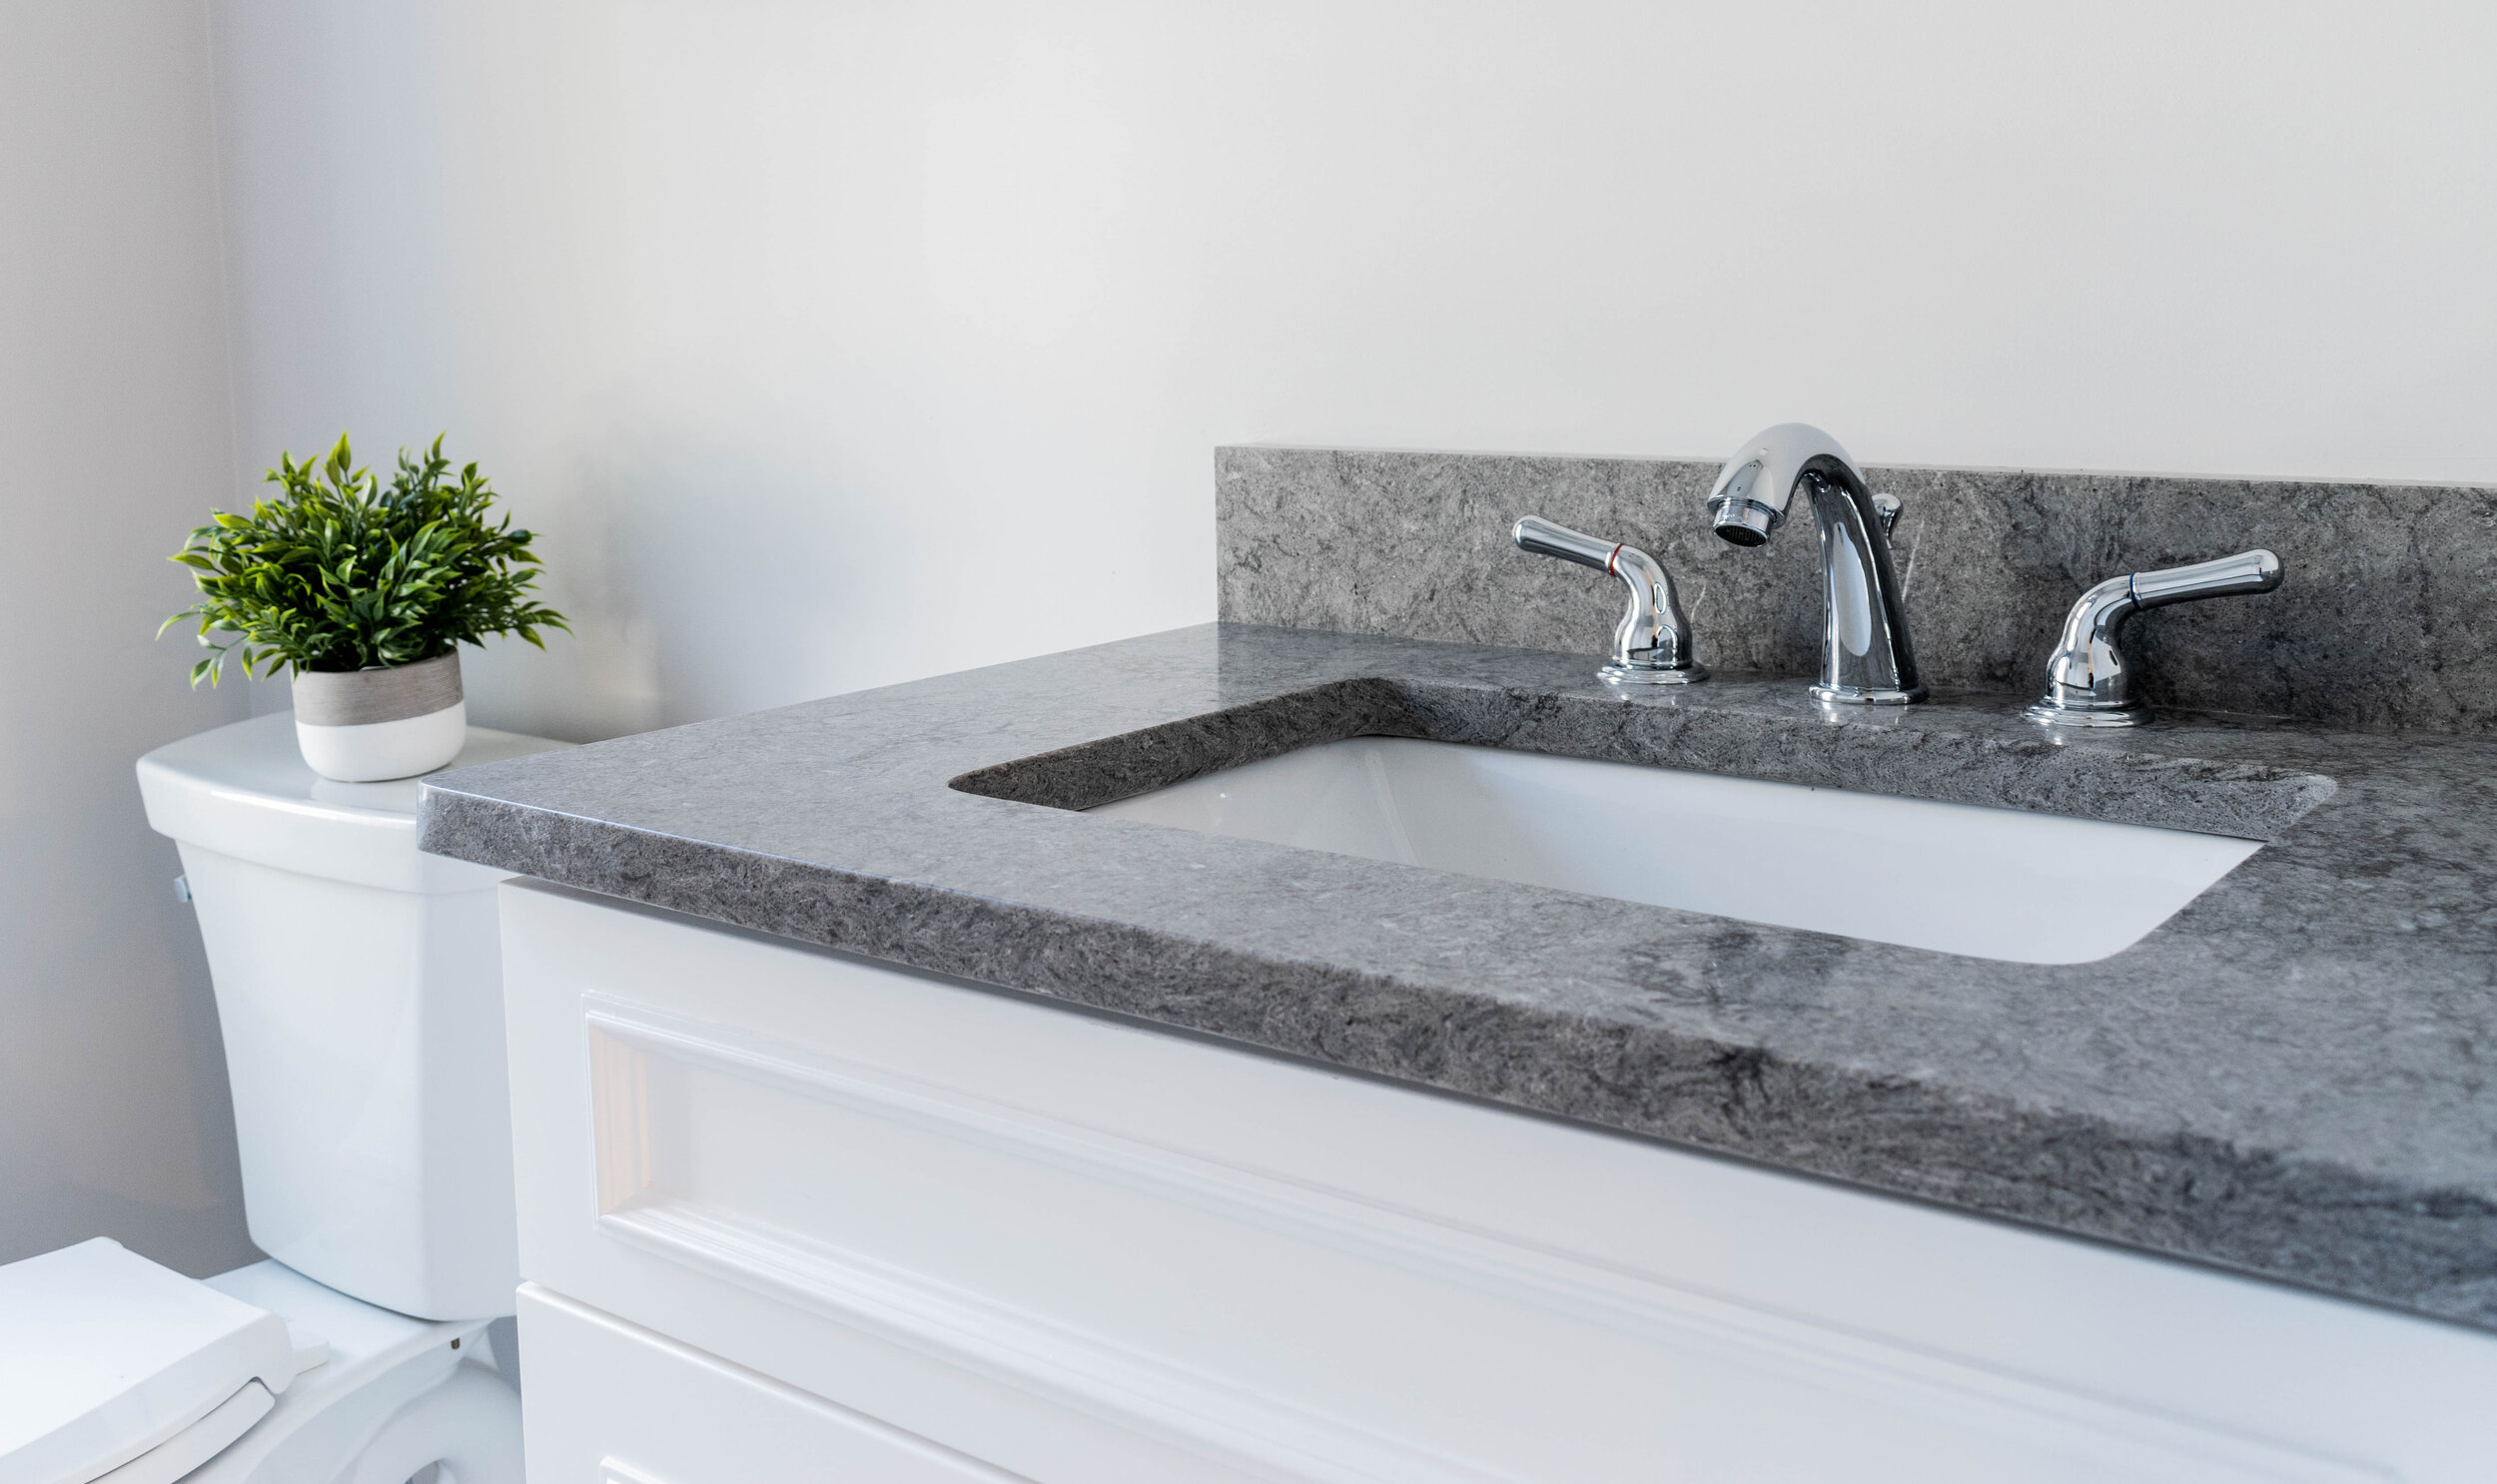 Material: Caesarstone - Turbine Grey (6313)  Thickness, Finish & Stone Type: 3CM Polished Quartz  Edge: Eased  Sink: KP-23W